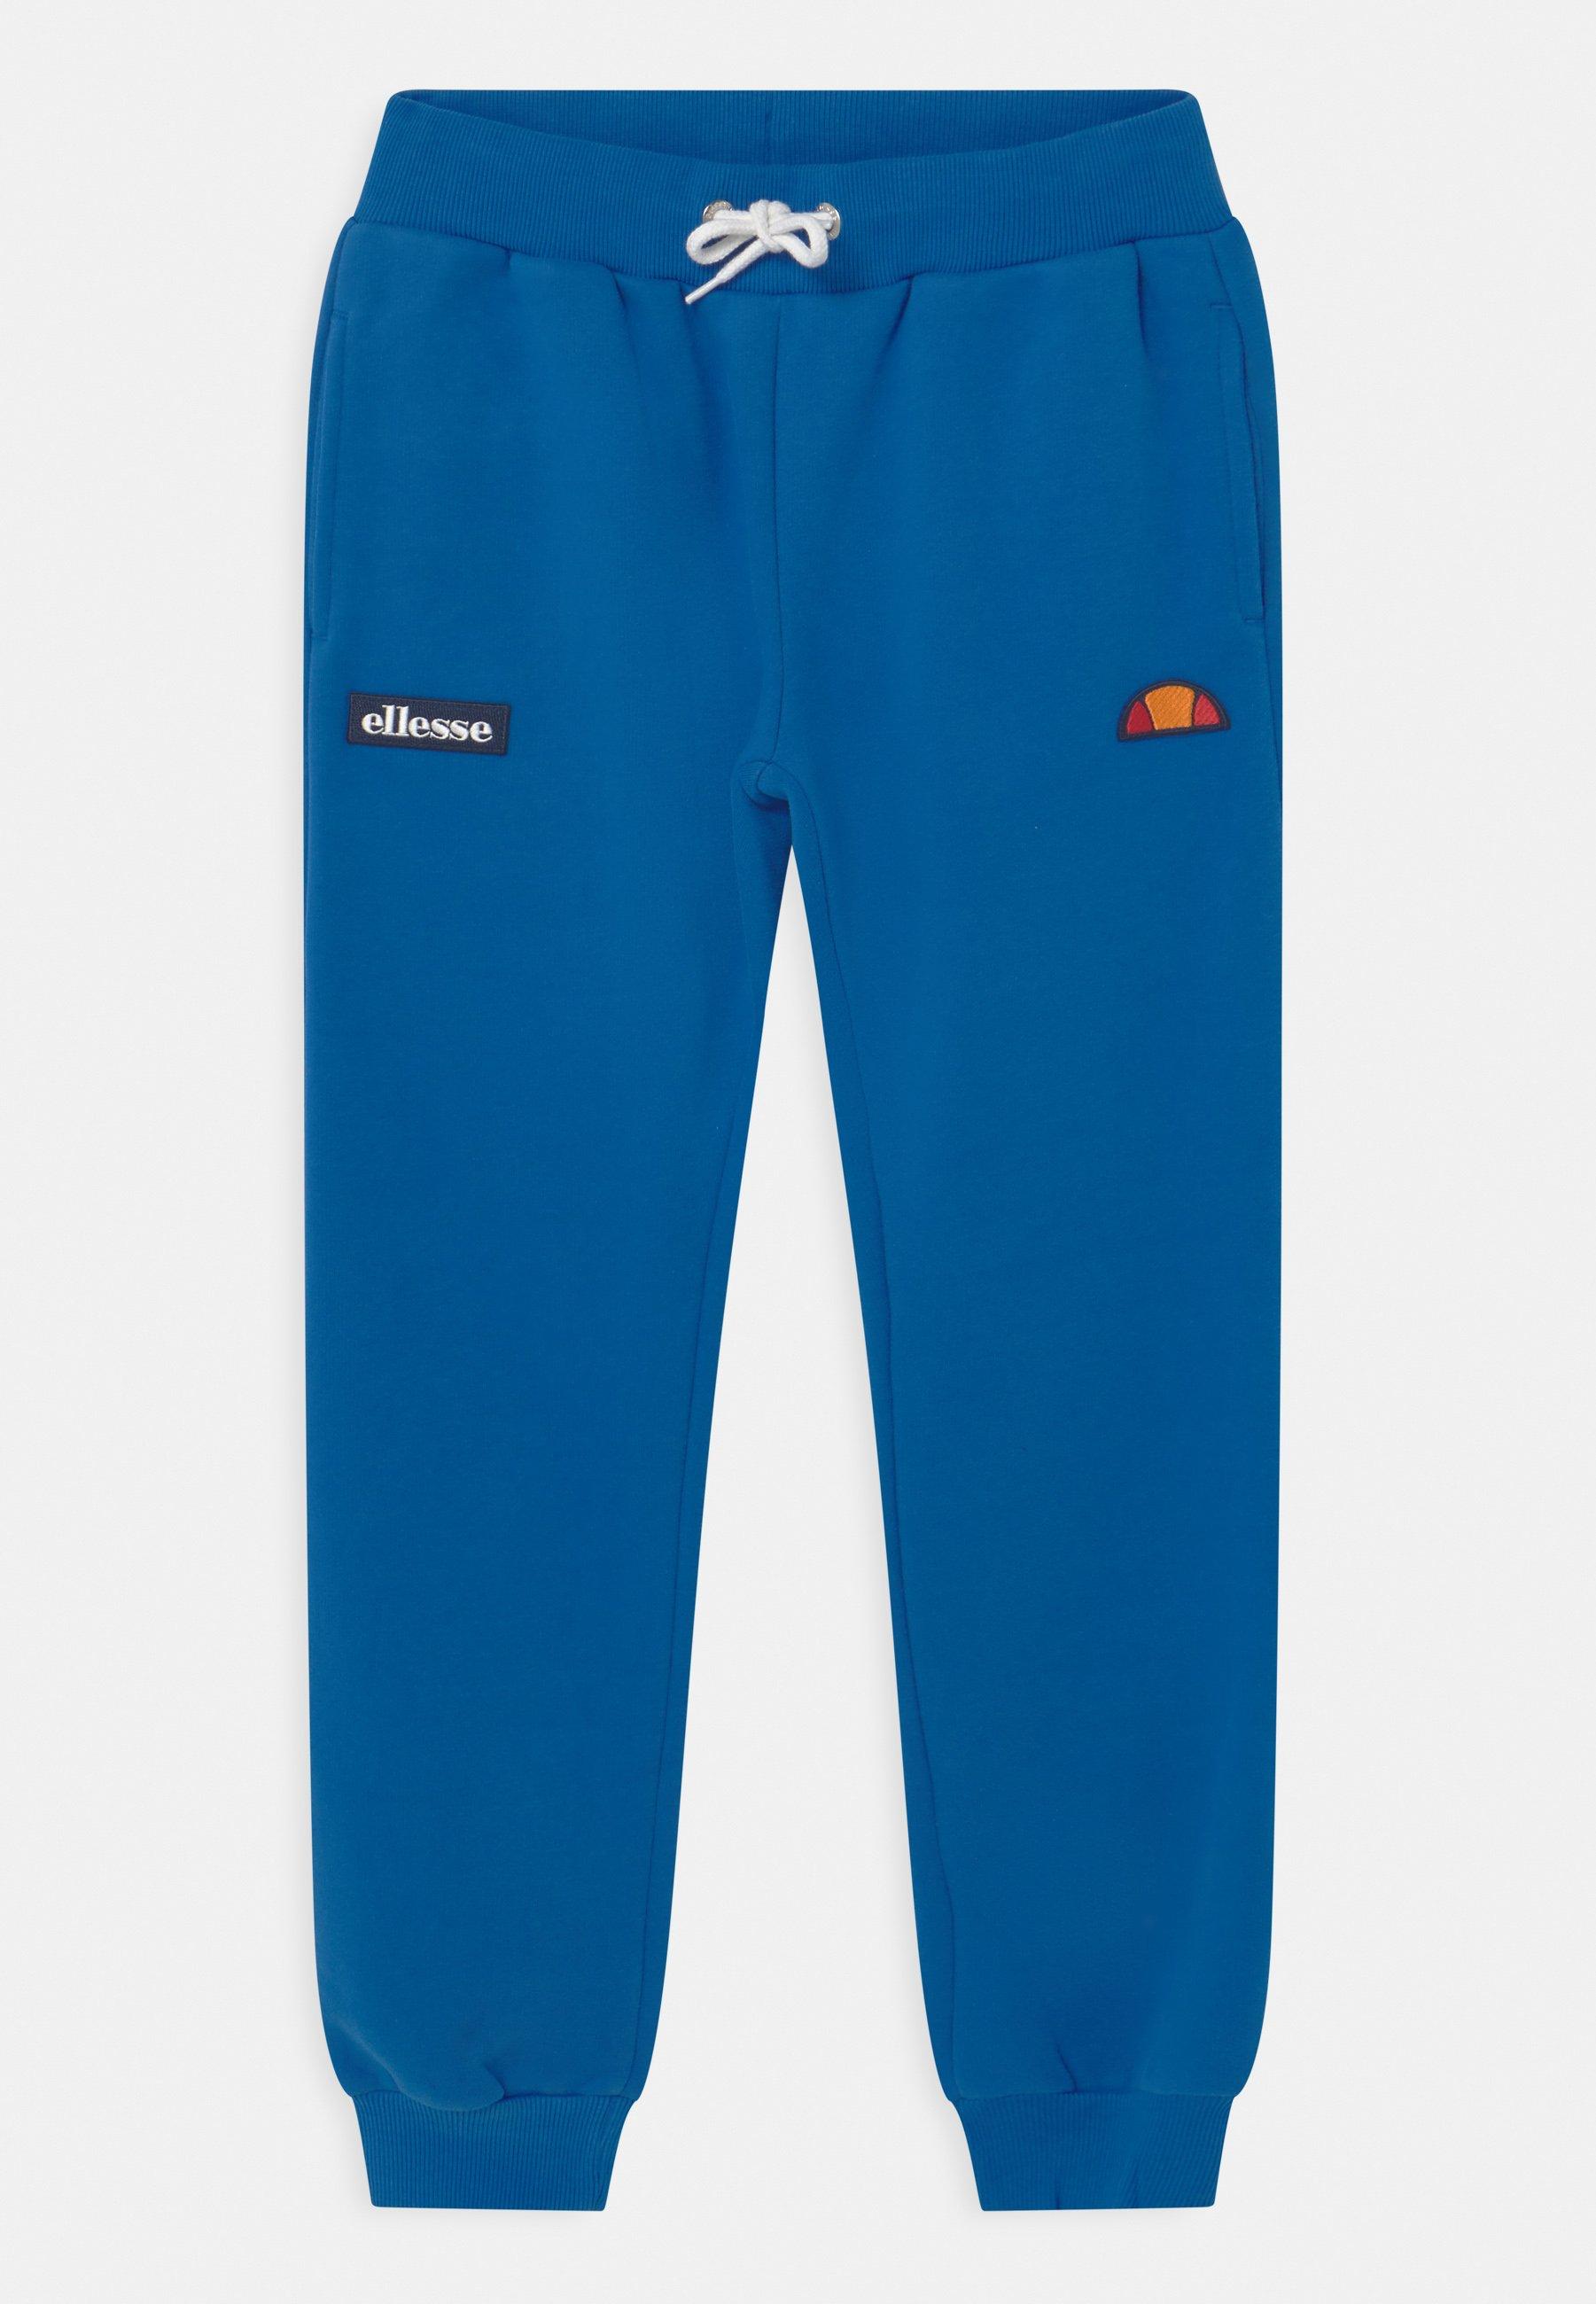 Bambini EDERSO - Pantaloni sportivi